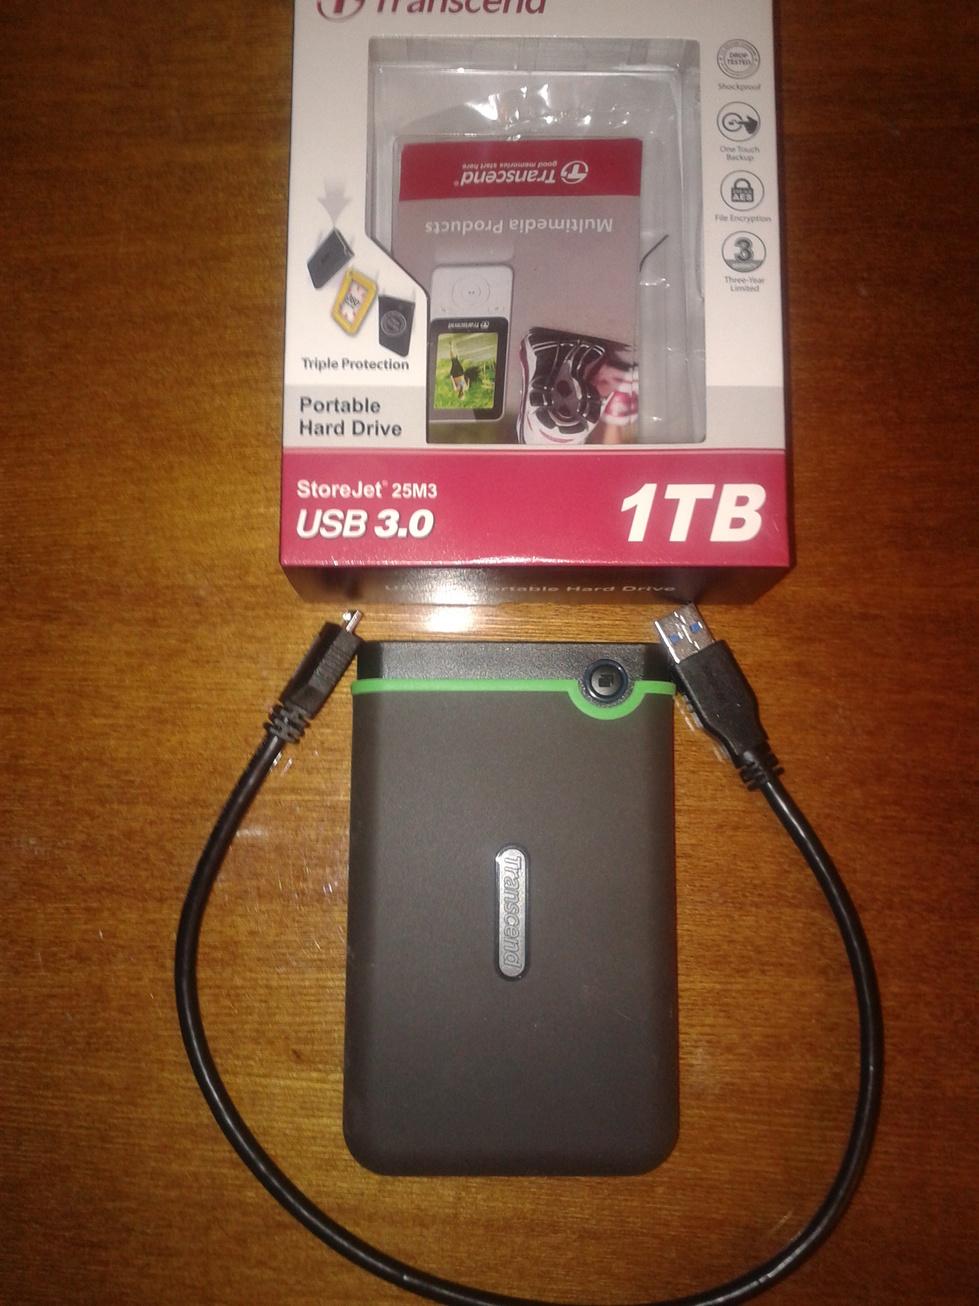 Внешний жёсткий диск Transcend StoreJet 25m3 (USB3.0),1TB